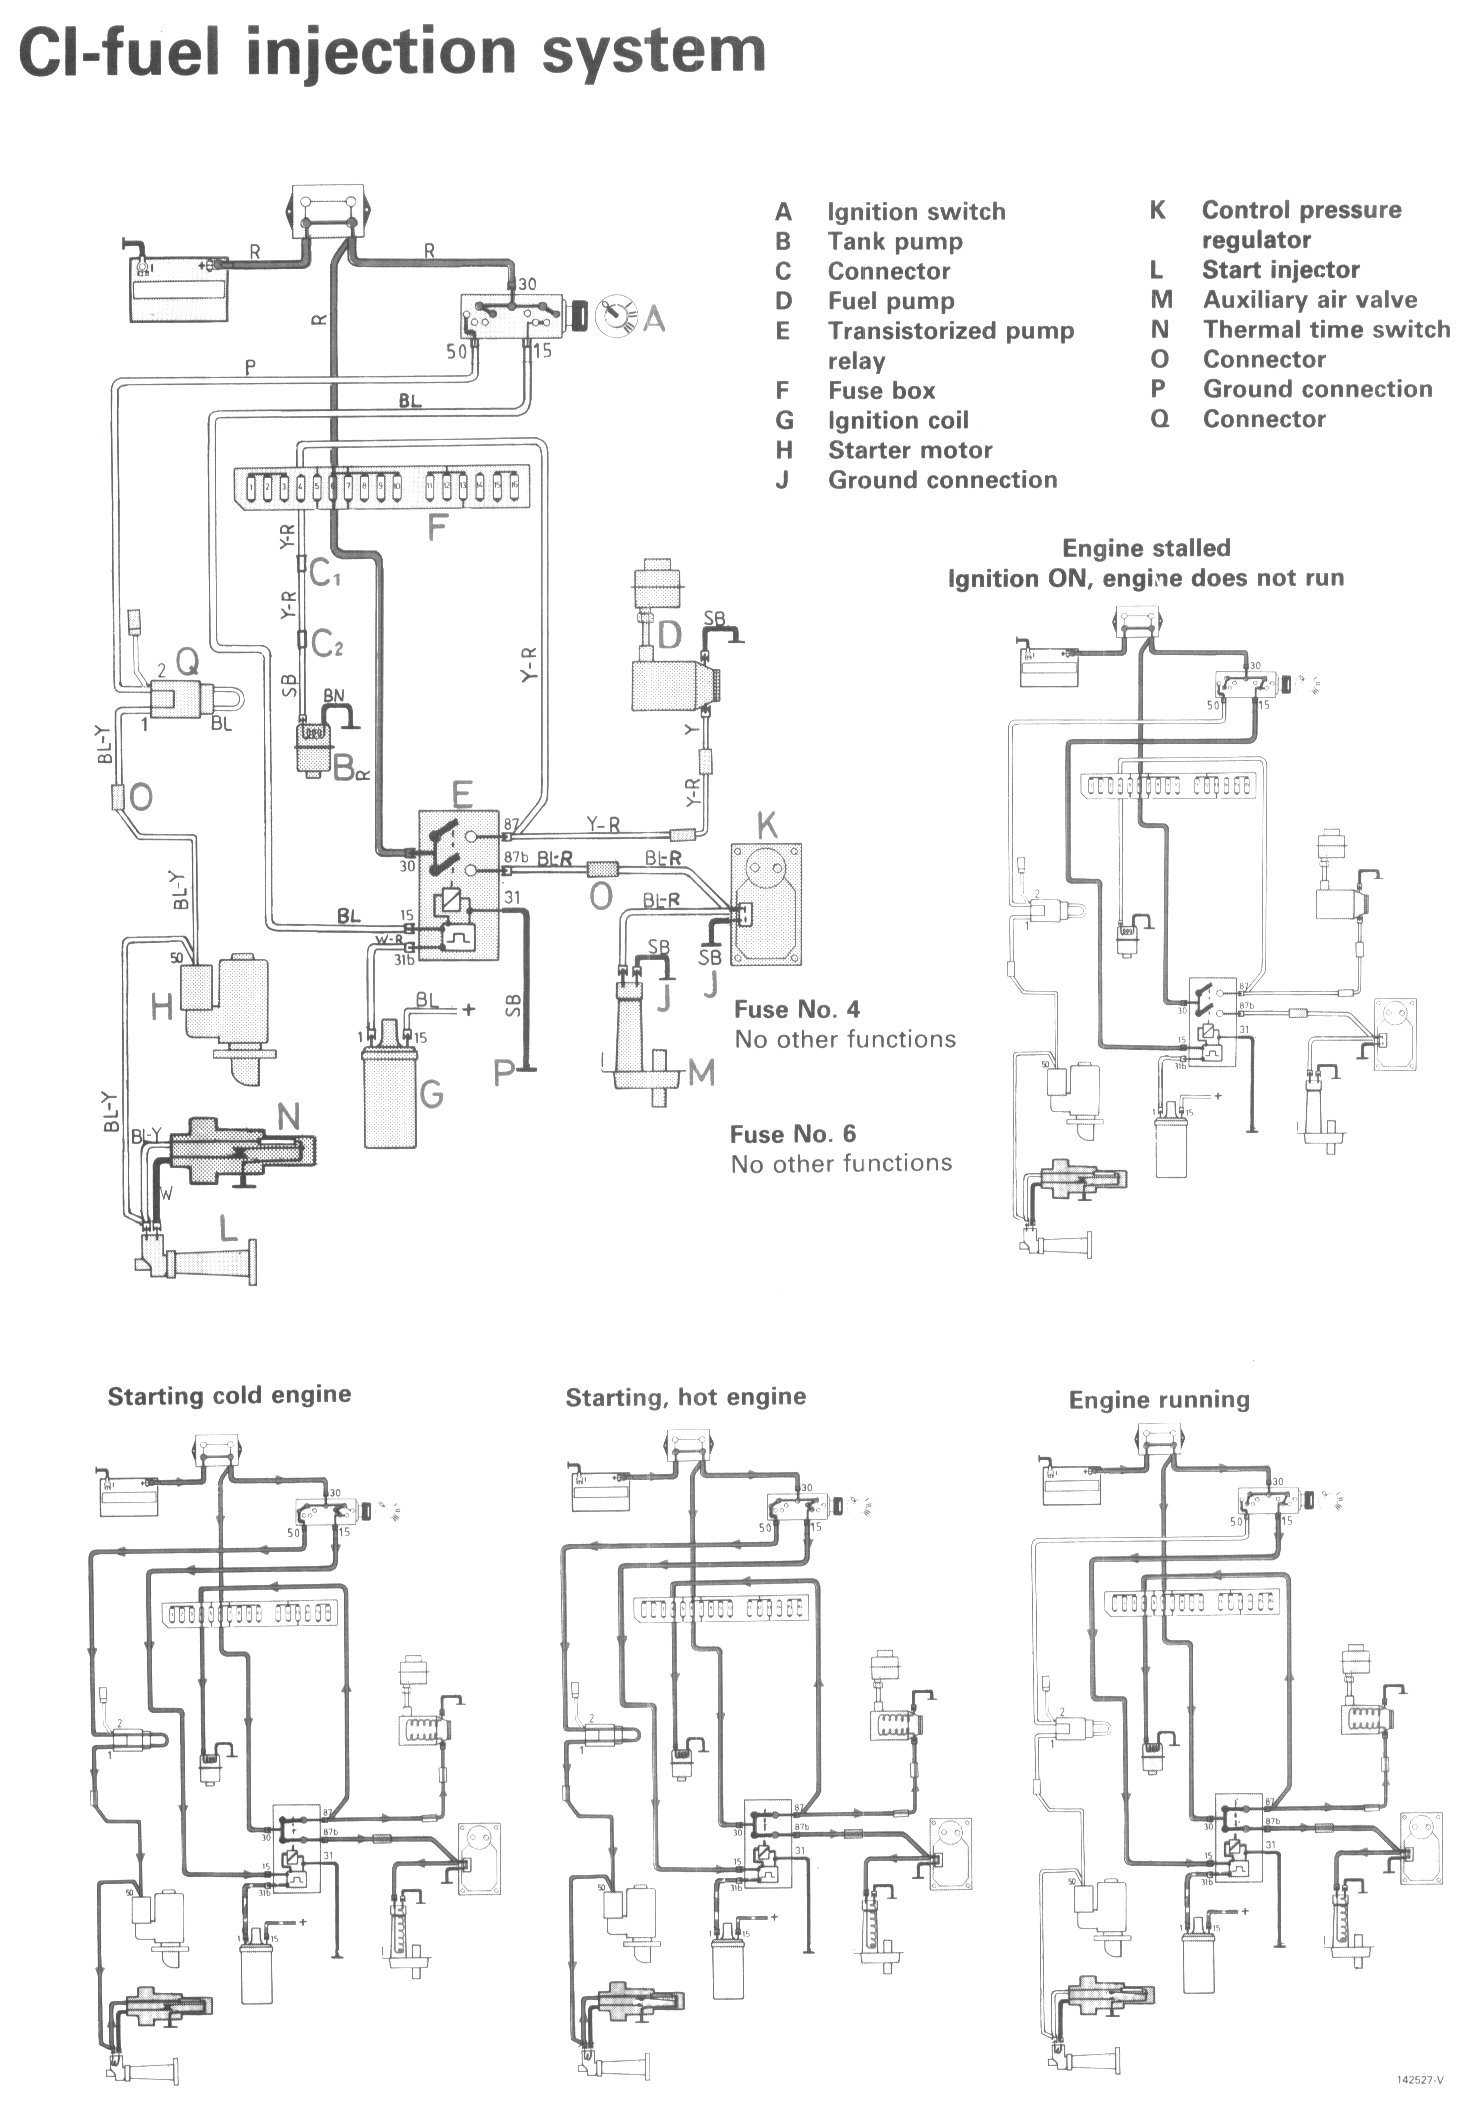 volvo 740 turbo fuel pump wiring diagram  volvo  free